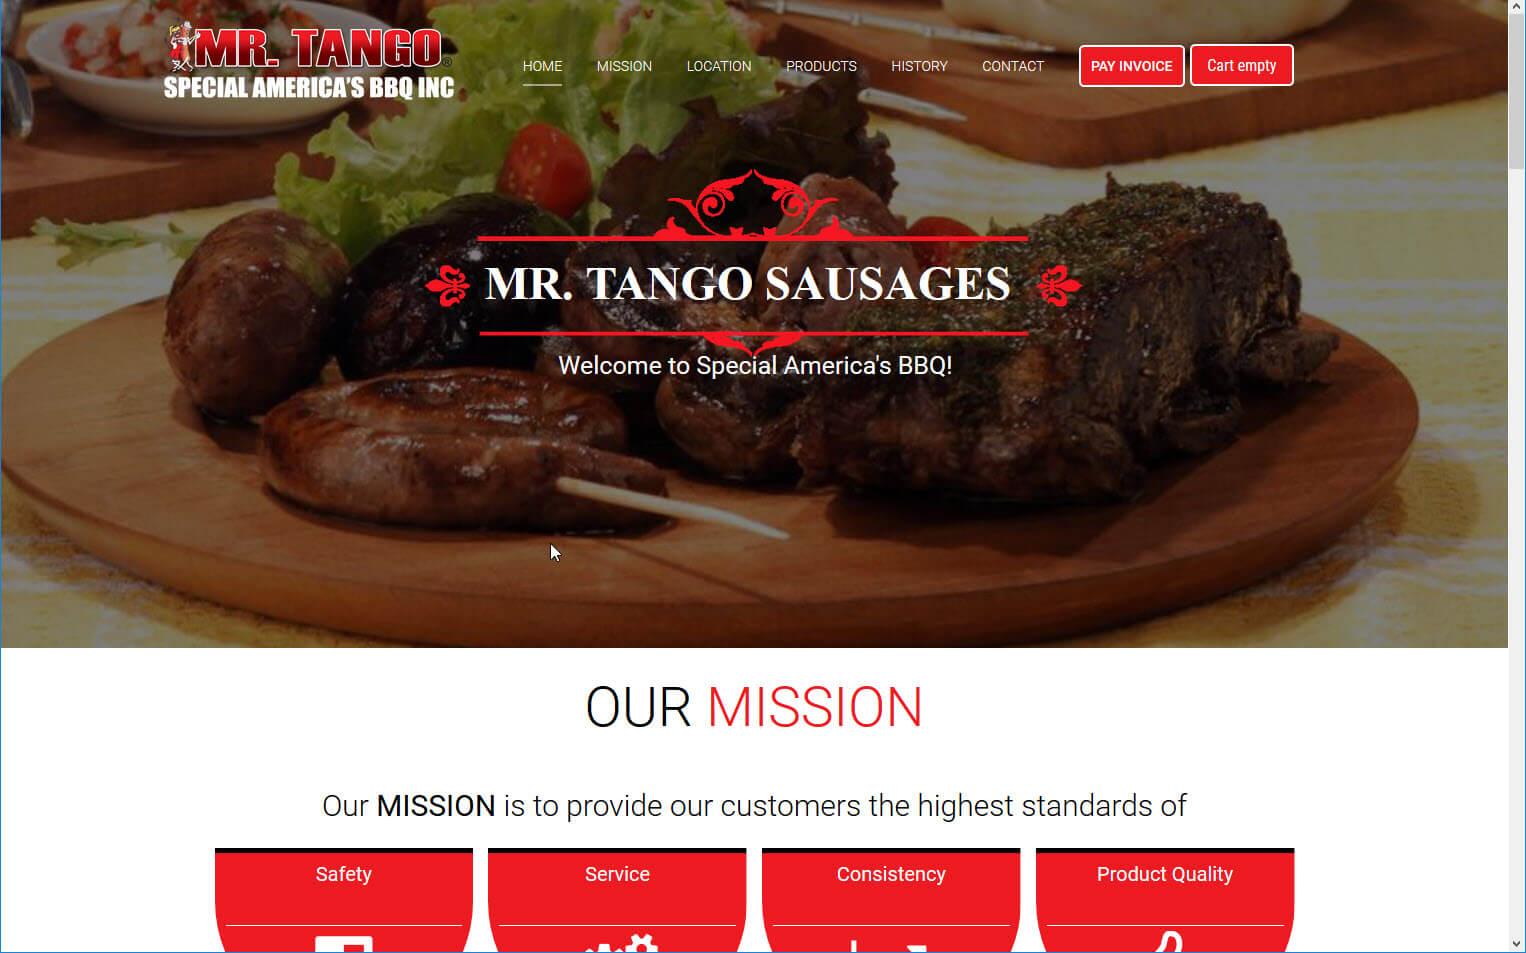 Mr. Tango Sausages